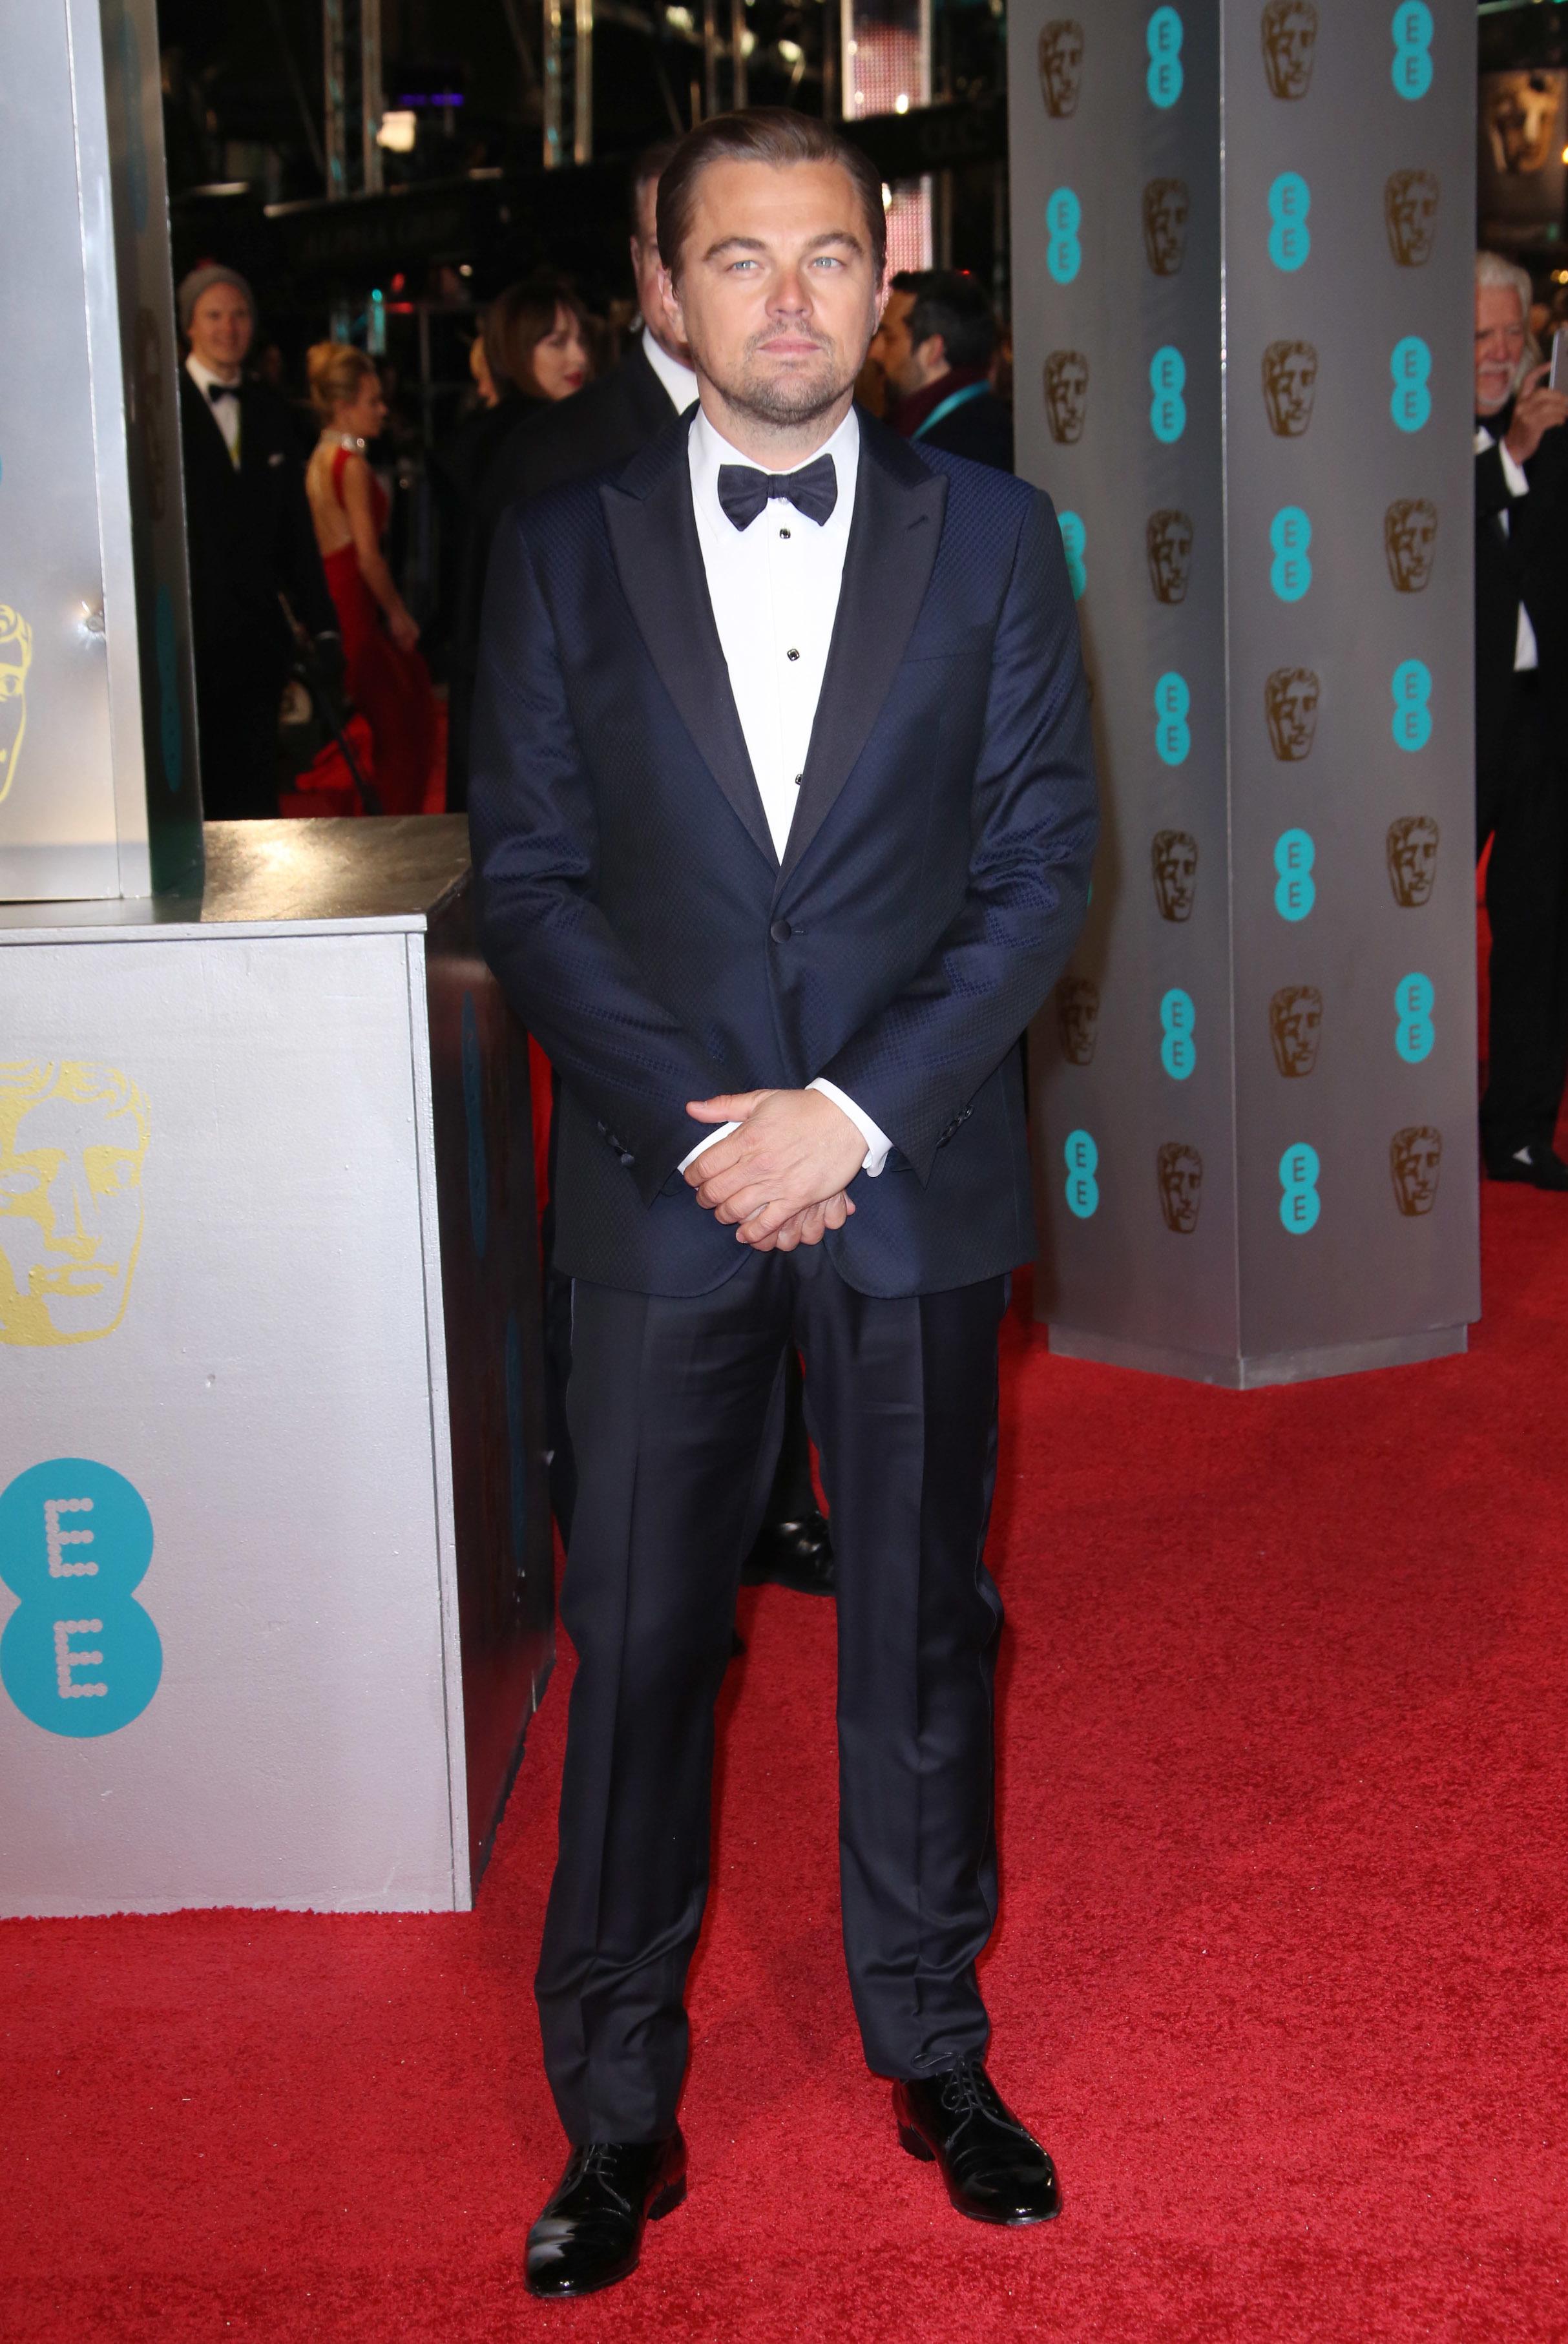 Leonardo DiCaprio's model friend throws cold water on romance rumors